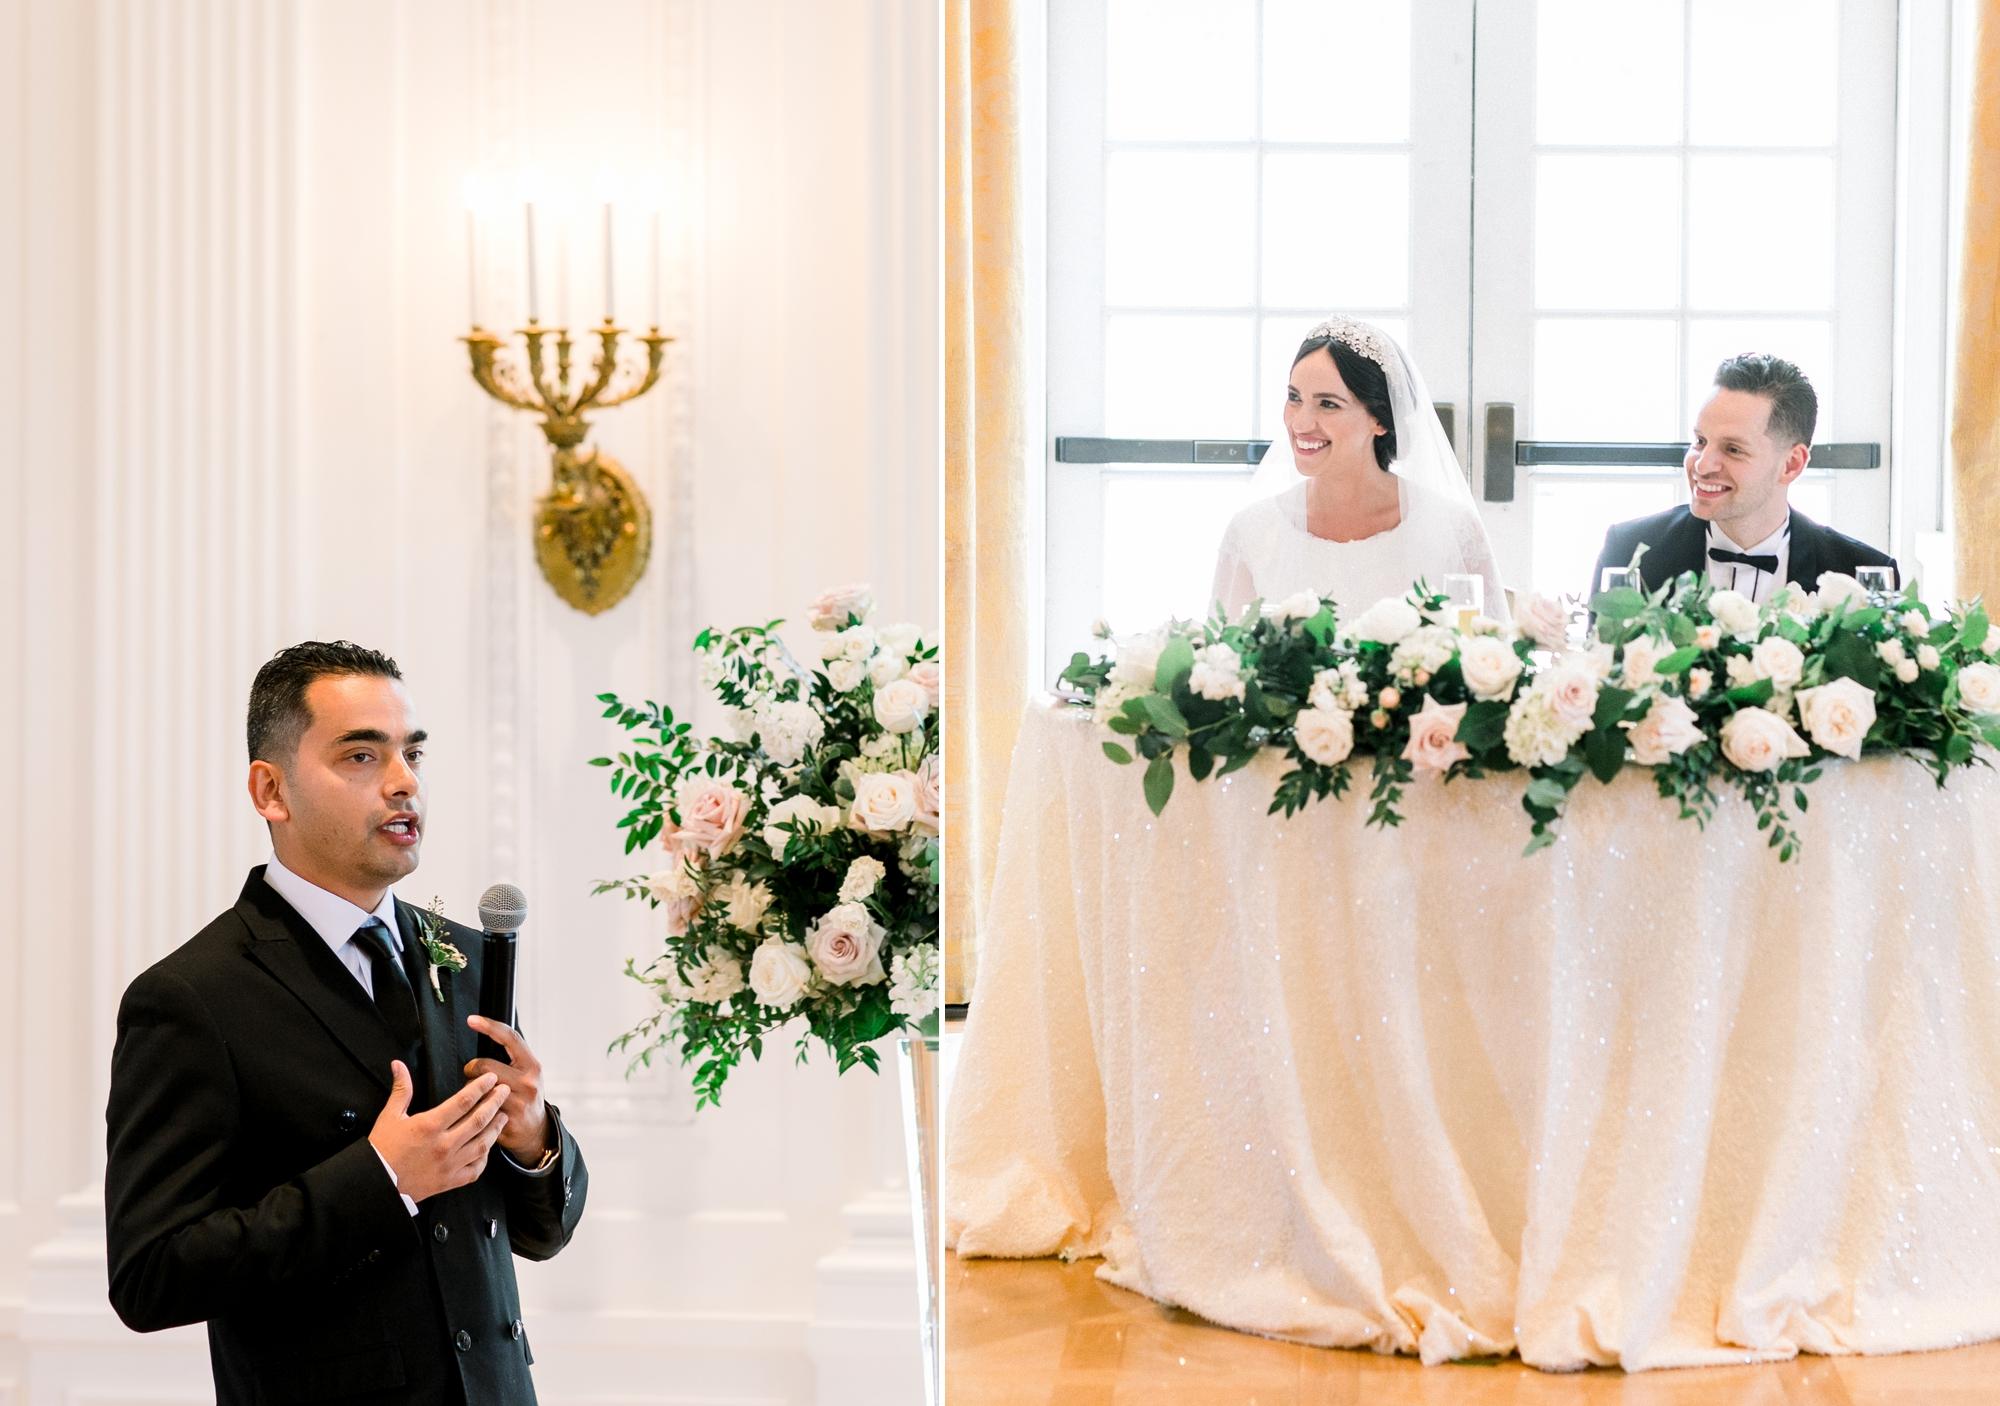 ROYAL-WEDDING-RICHARD-NIXON-LIBRARY 11.jpg